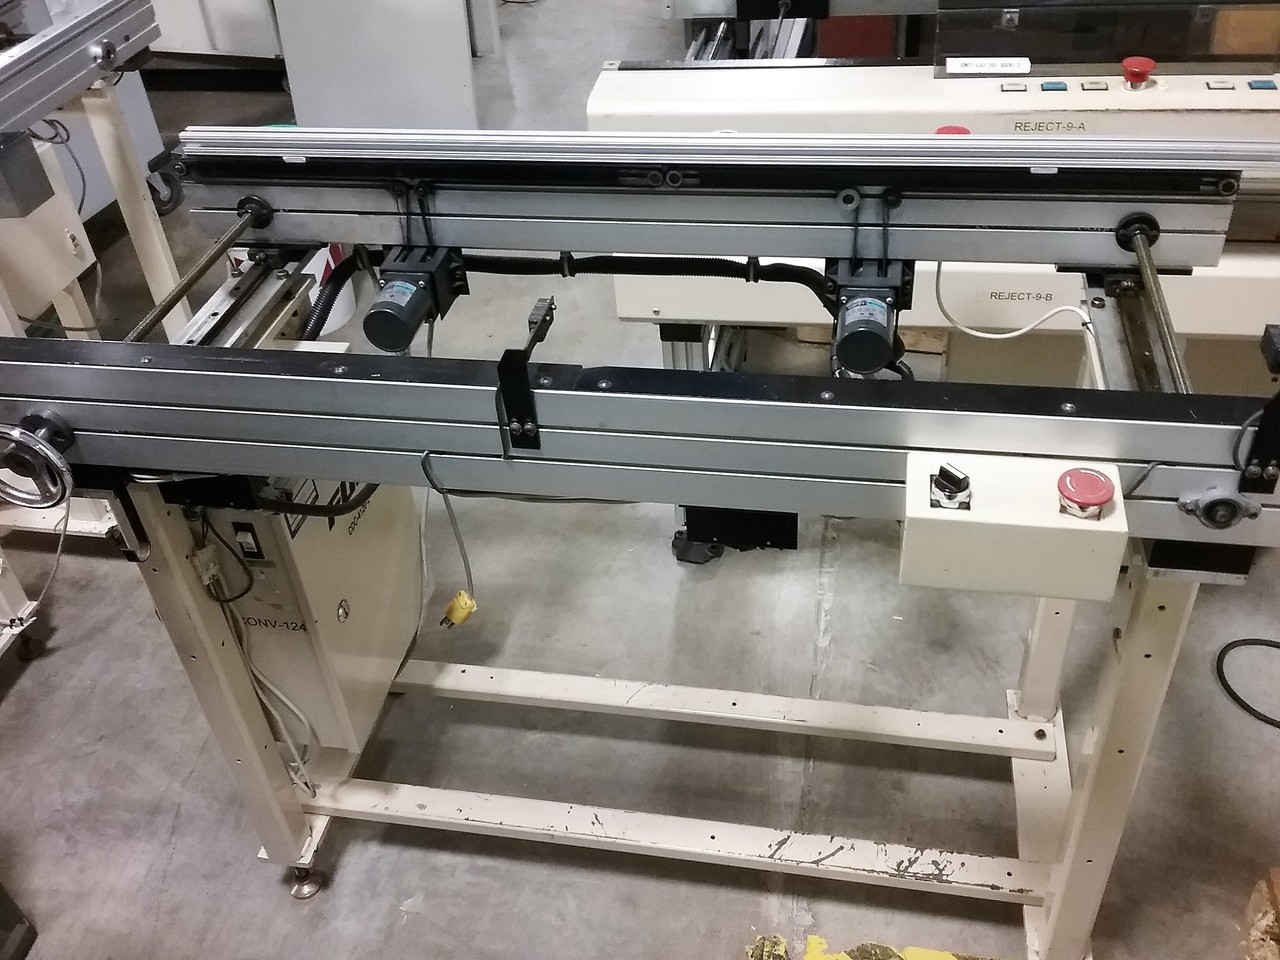 "Fuji CDC-4120-2 47.25"" Inspection Conveyor (180104)"